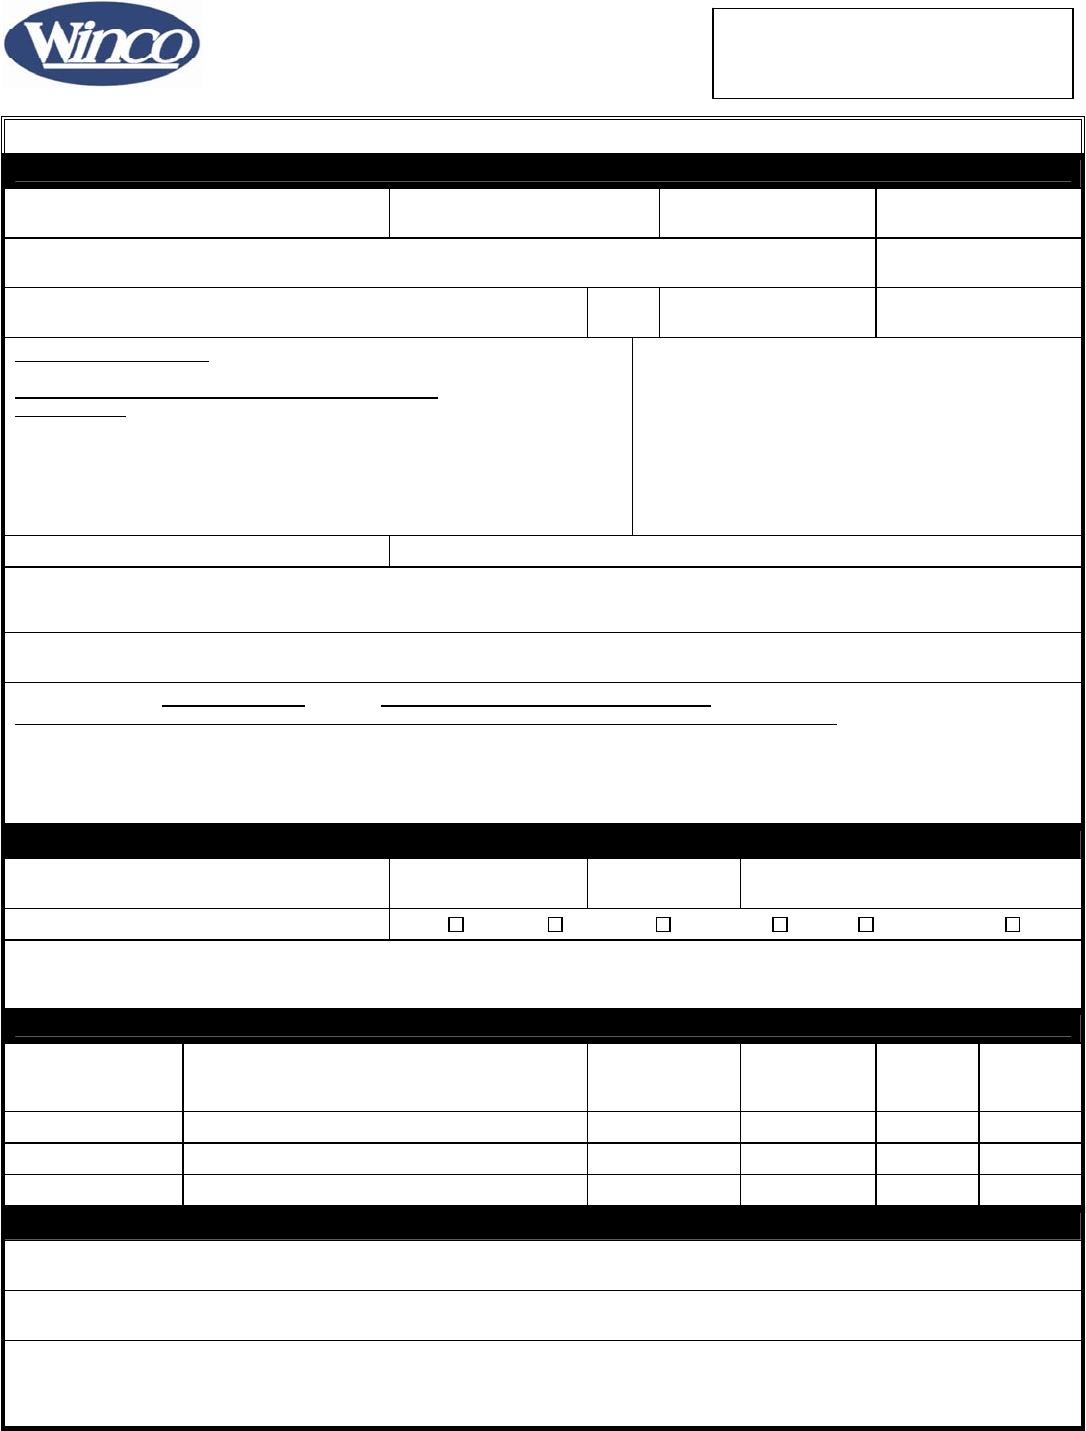 Free printable winco foods job application form falaconquin